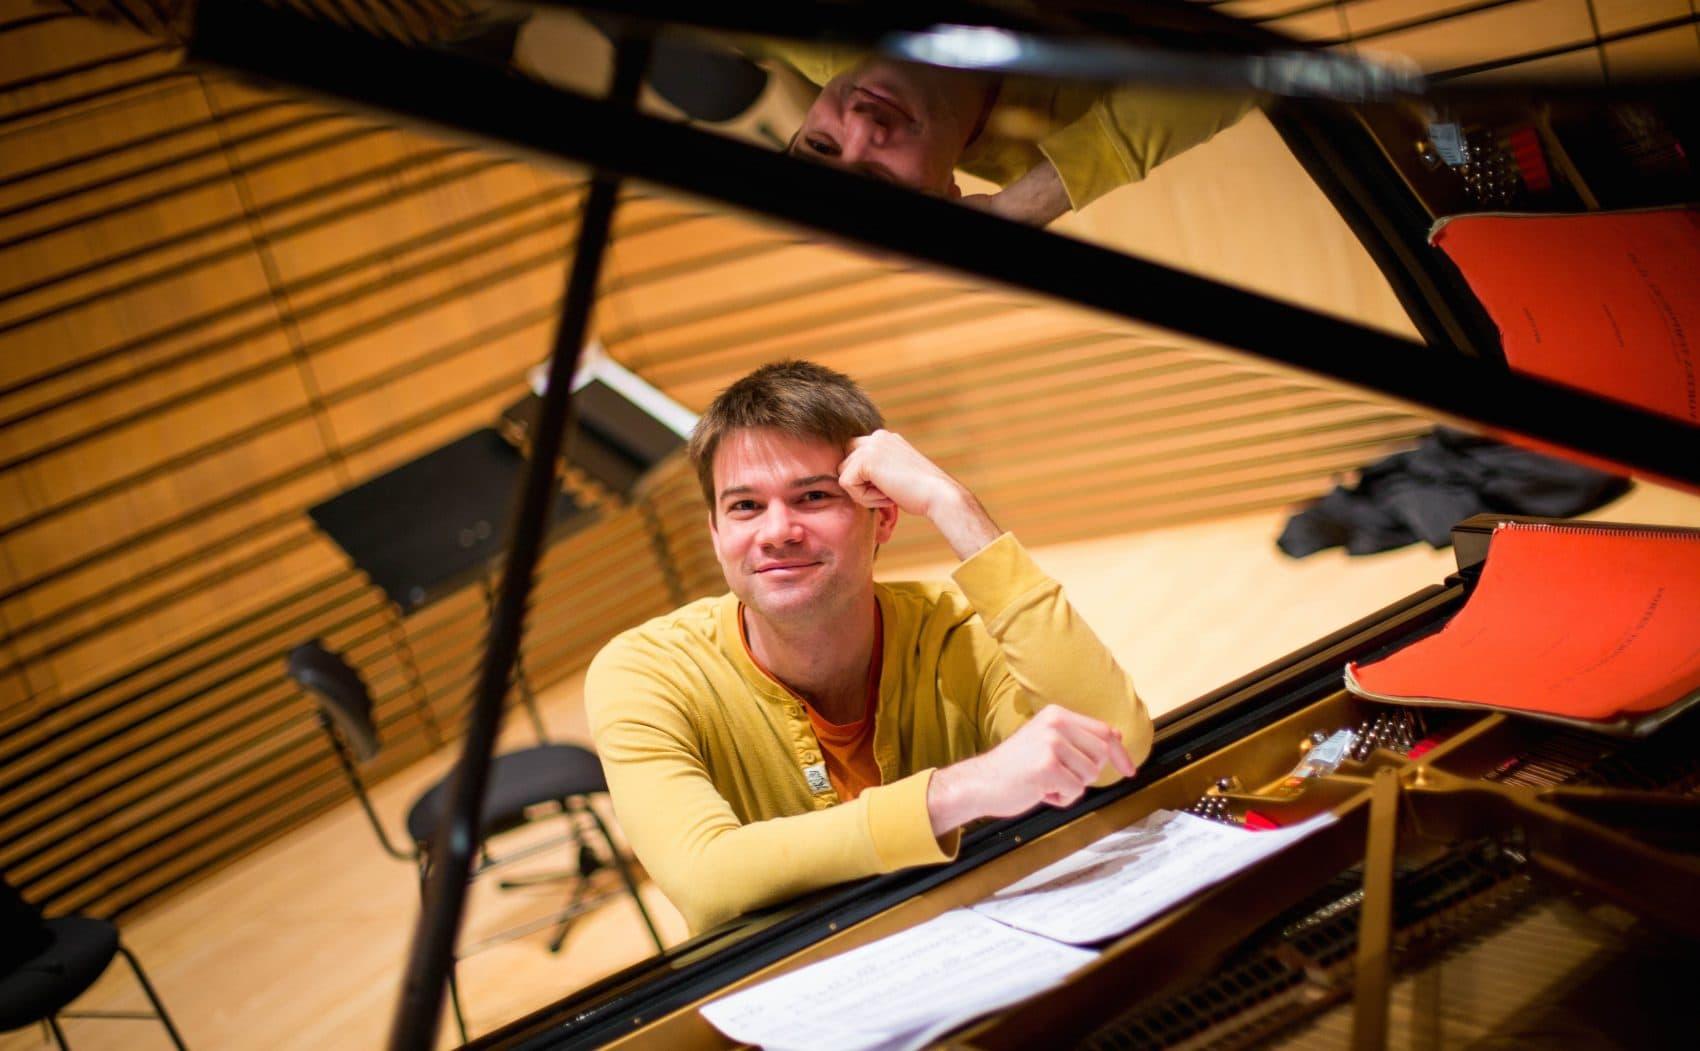 Ecce Ensemble artistic director John Aylward. (Courtesy Faremis Visuals)